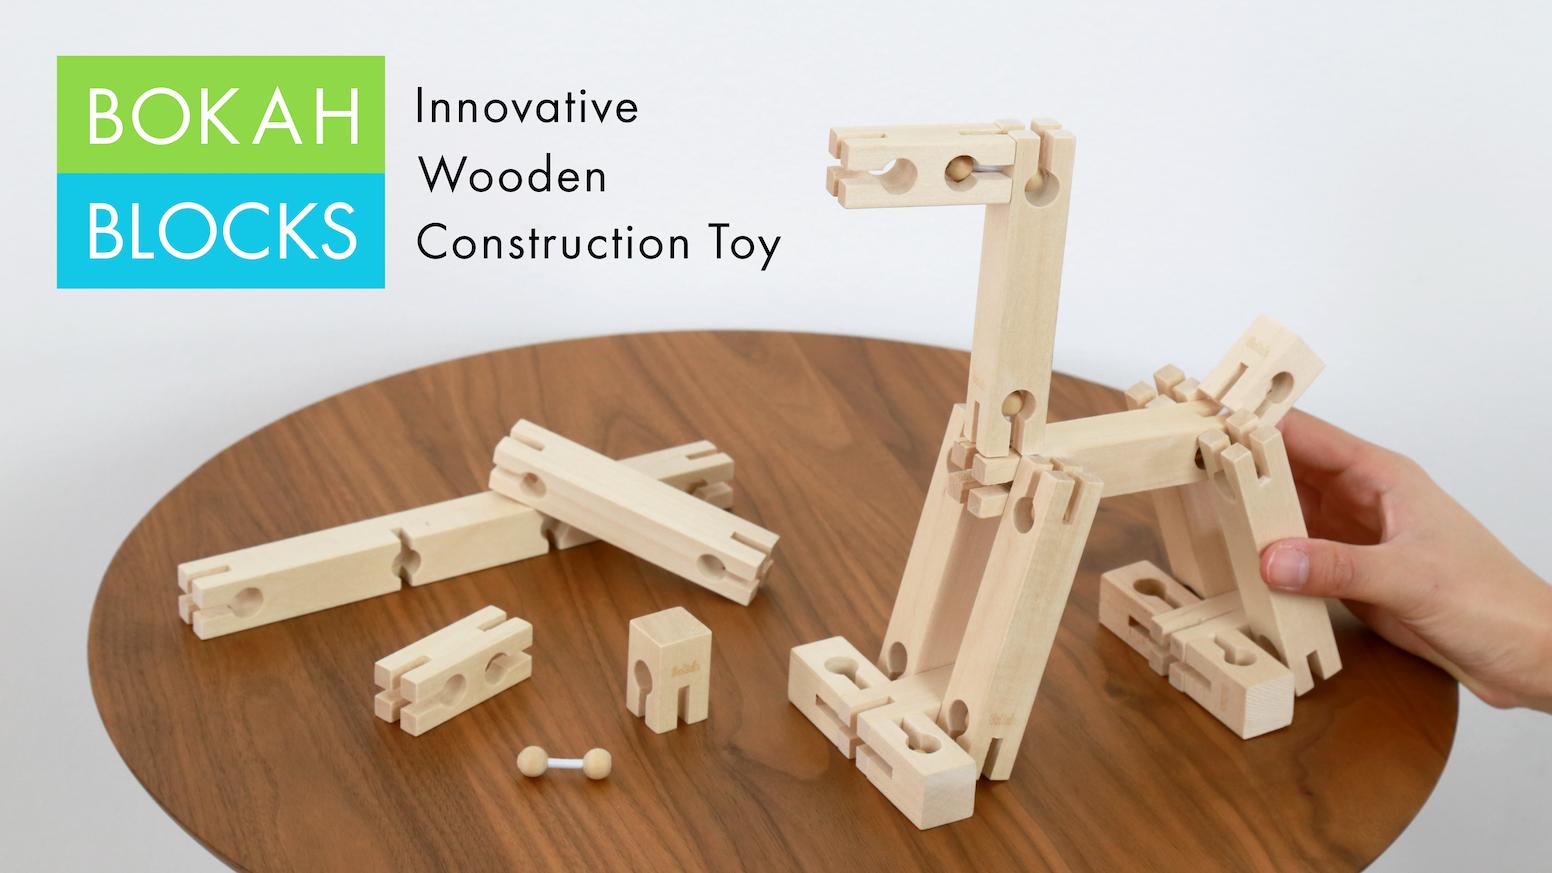 Wooden Construction Toys : Bokah blocks next generation wooden construction toy by